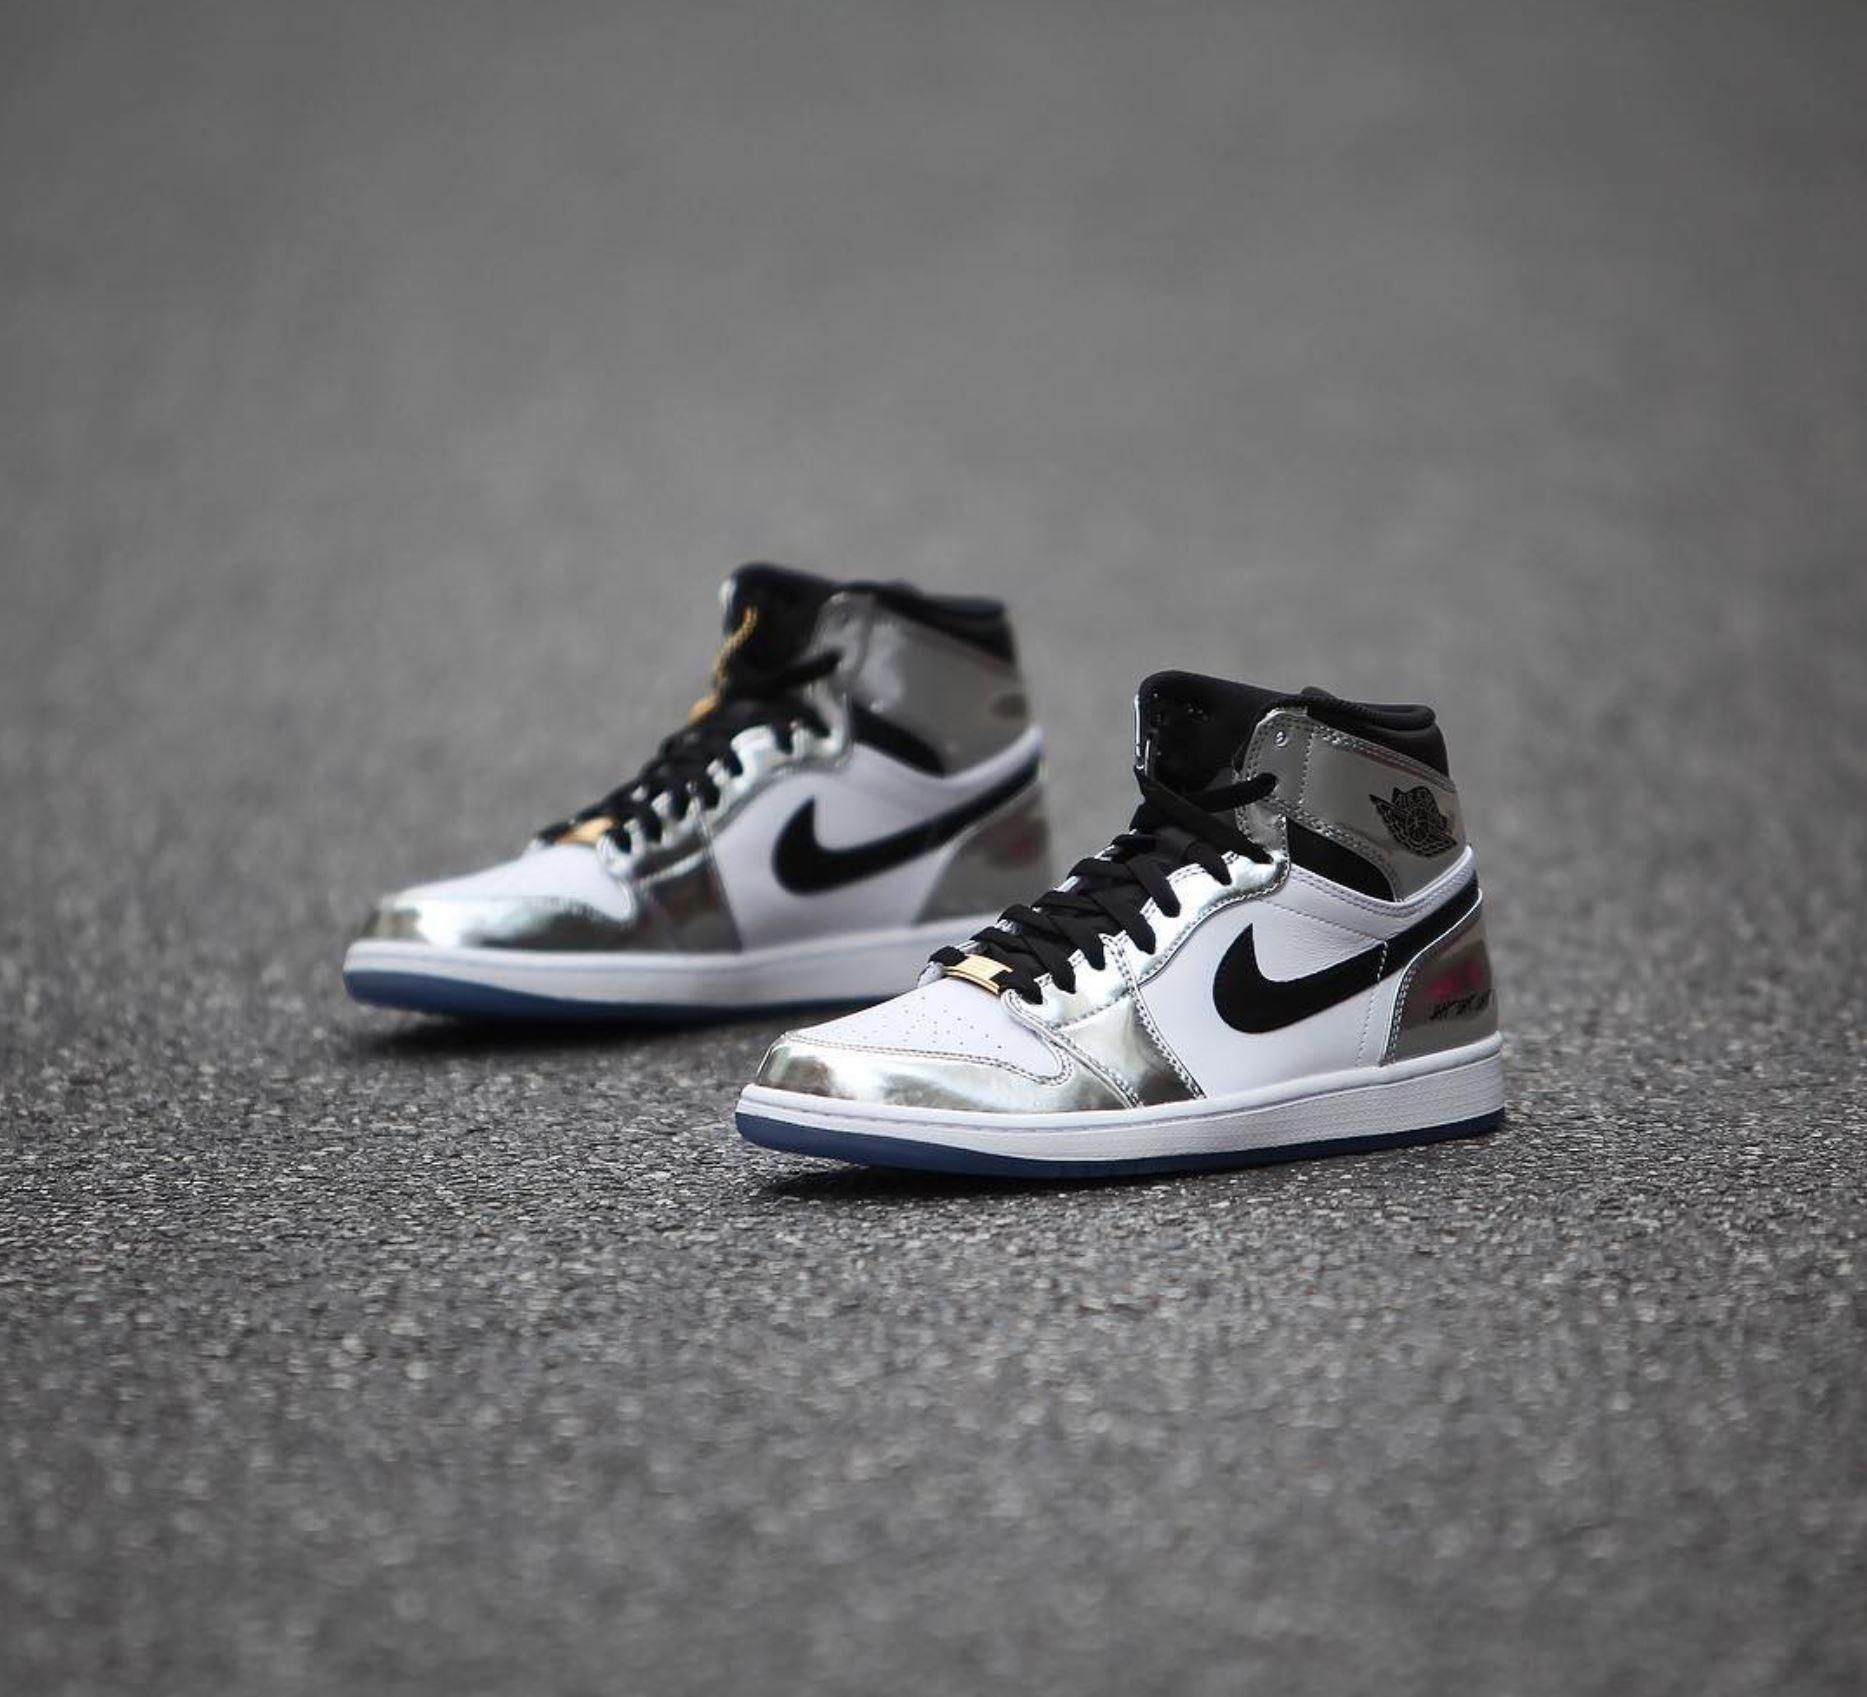 best sneakers d1c40 3b08d kawhi leonard air jordan 1 pass the torch 3 - WearTesters